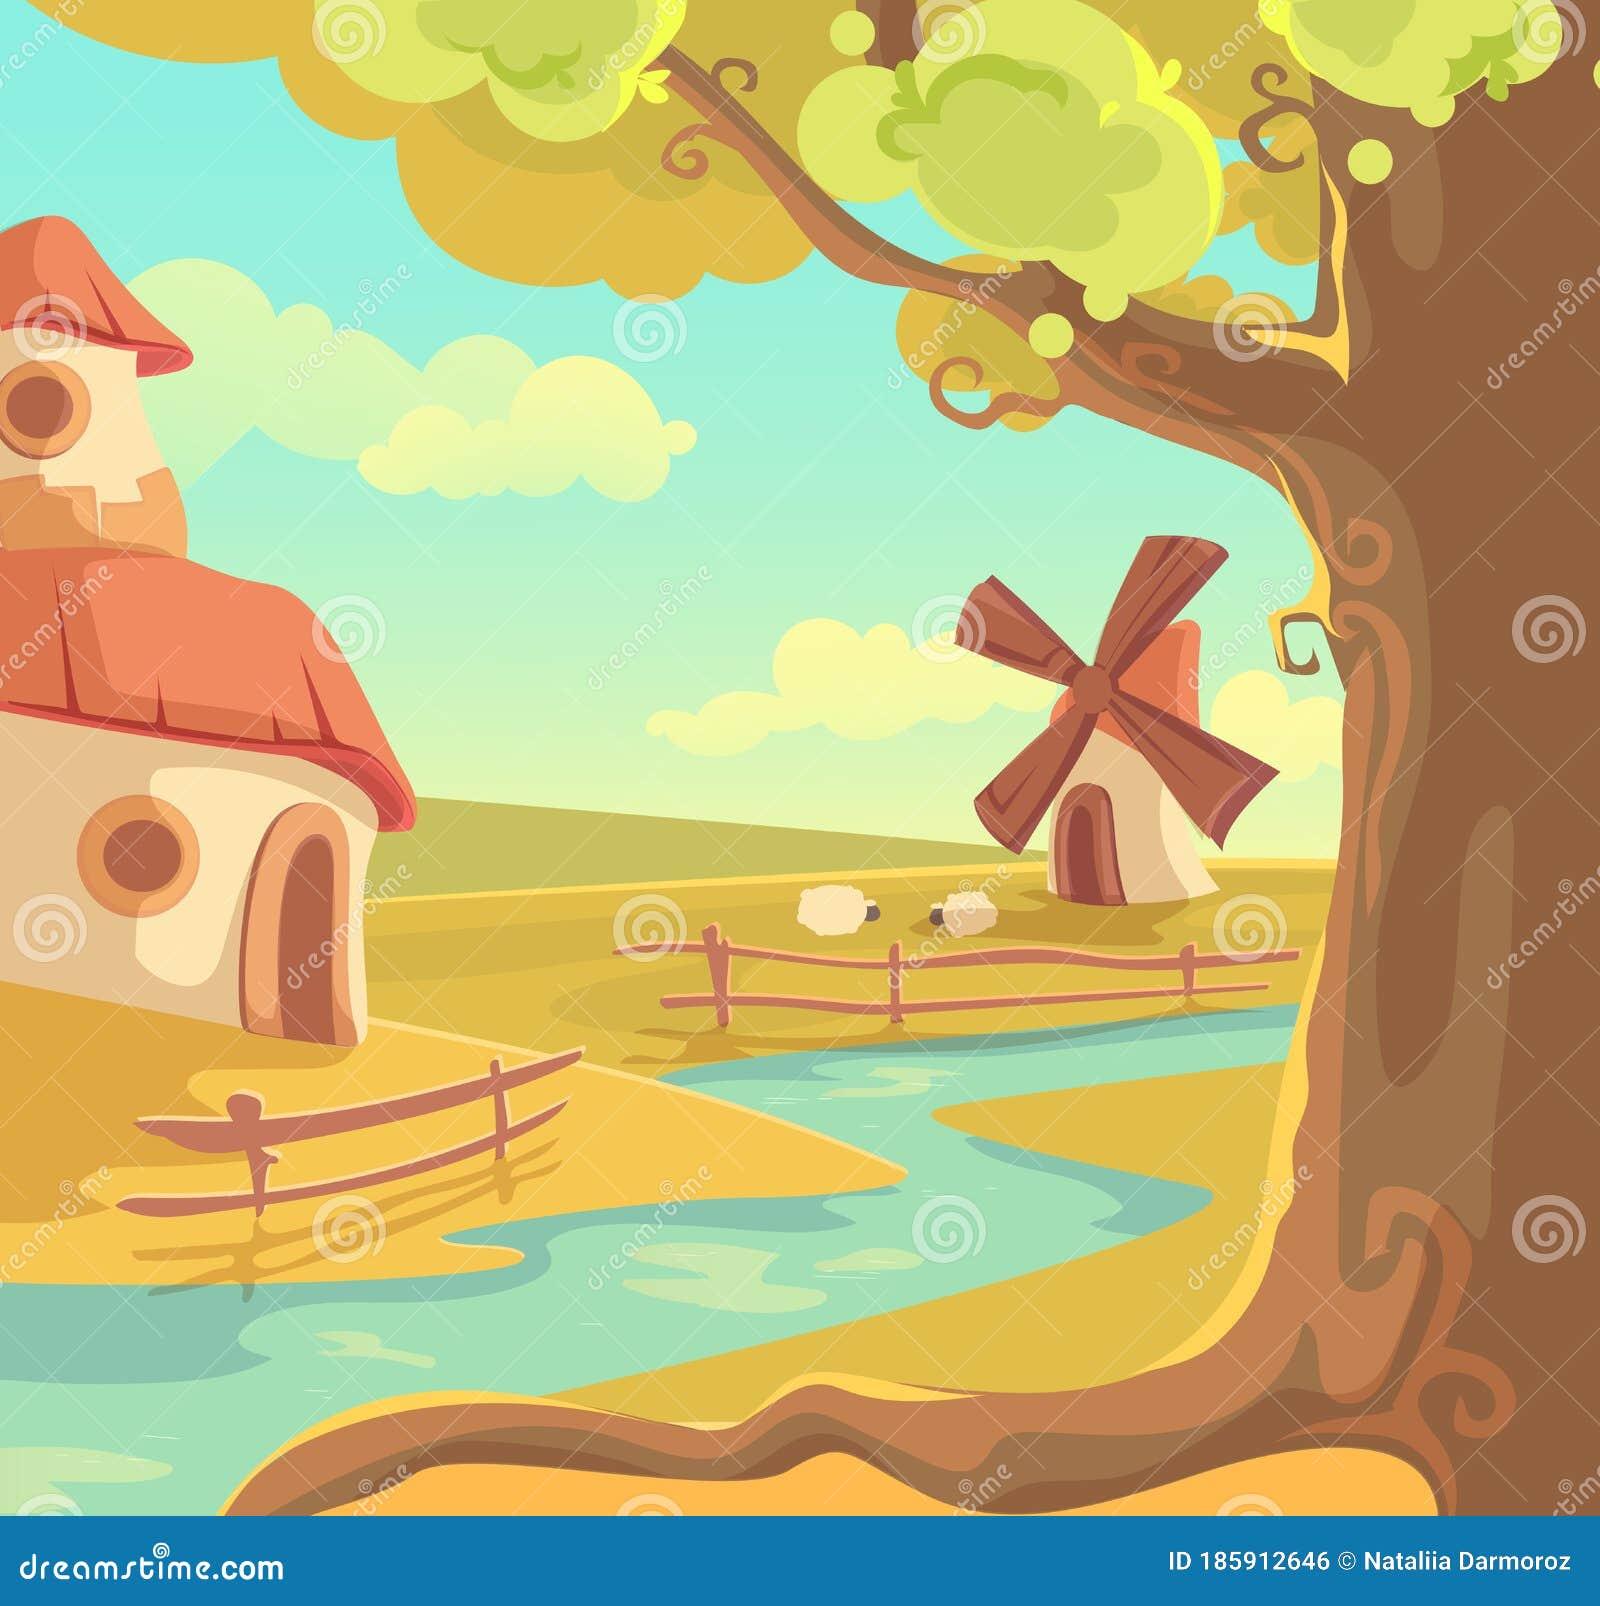 Download Beautiful Fantasy Village Art JPG